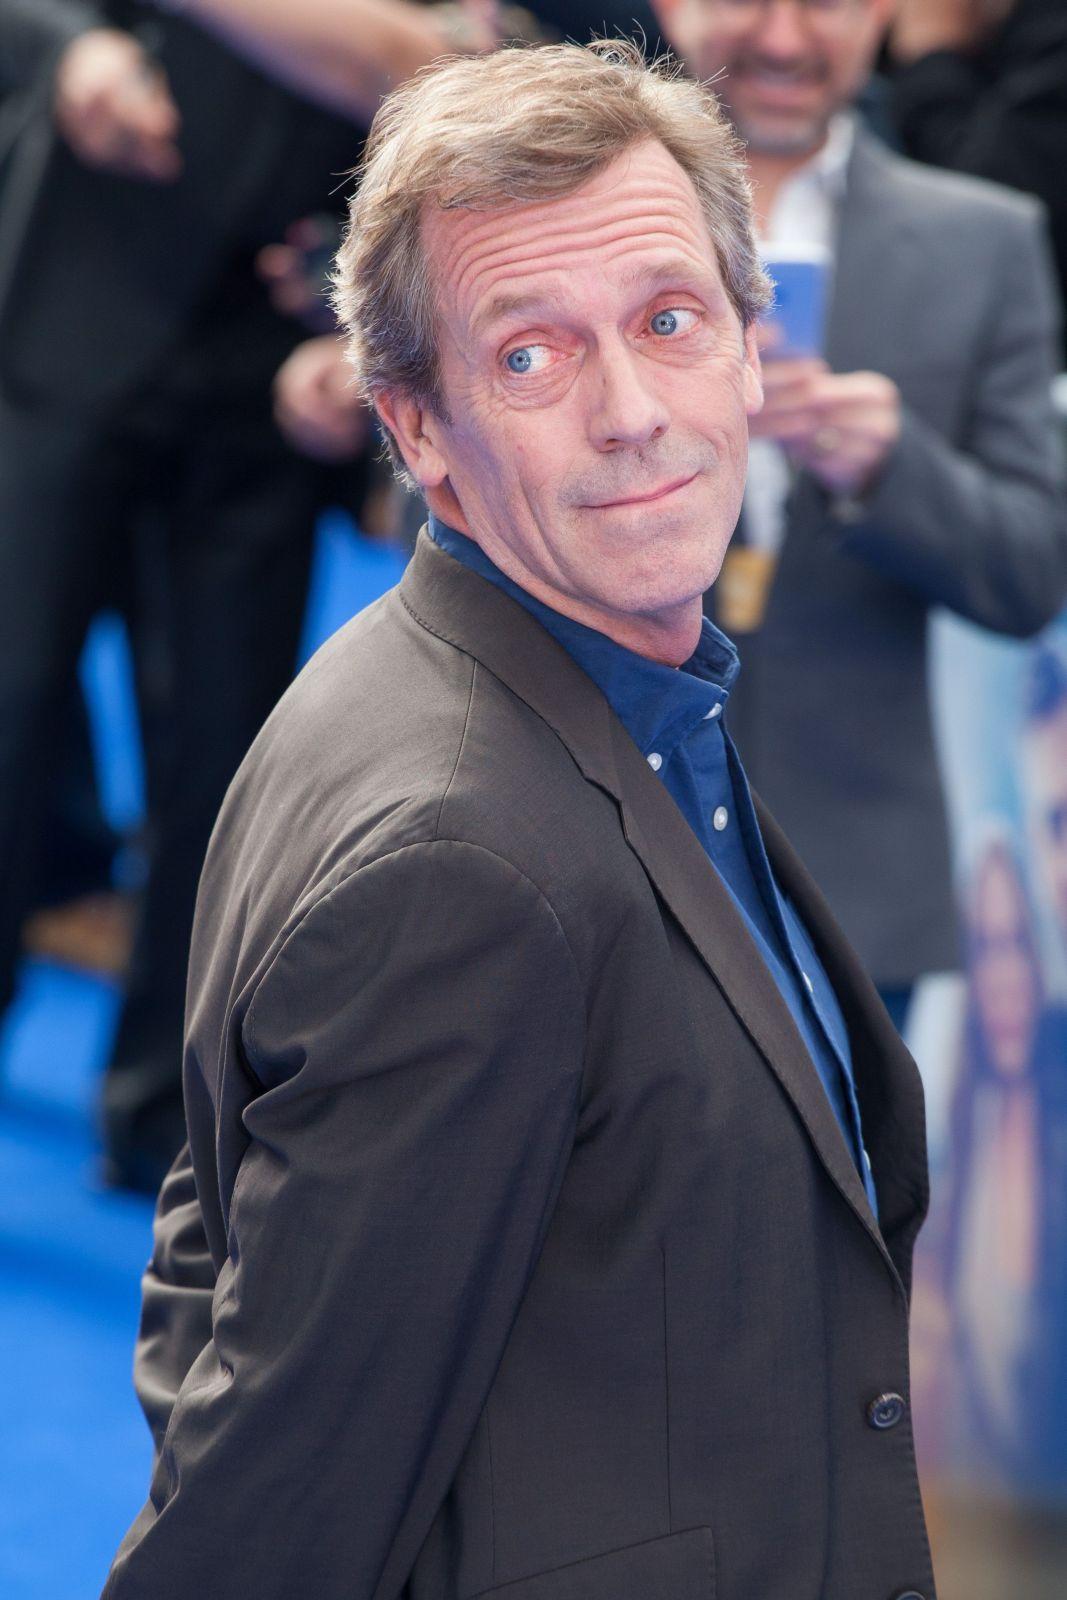 Hugh Laurie6 - Tomorrowland Premiere London 2015.jpg